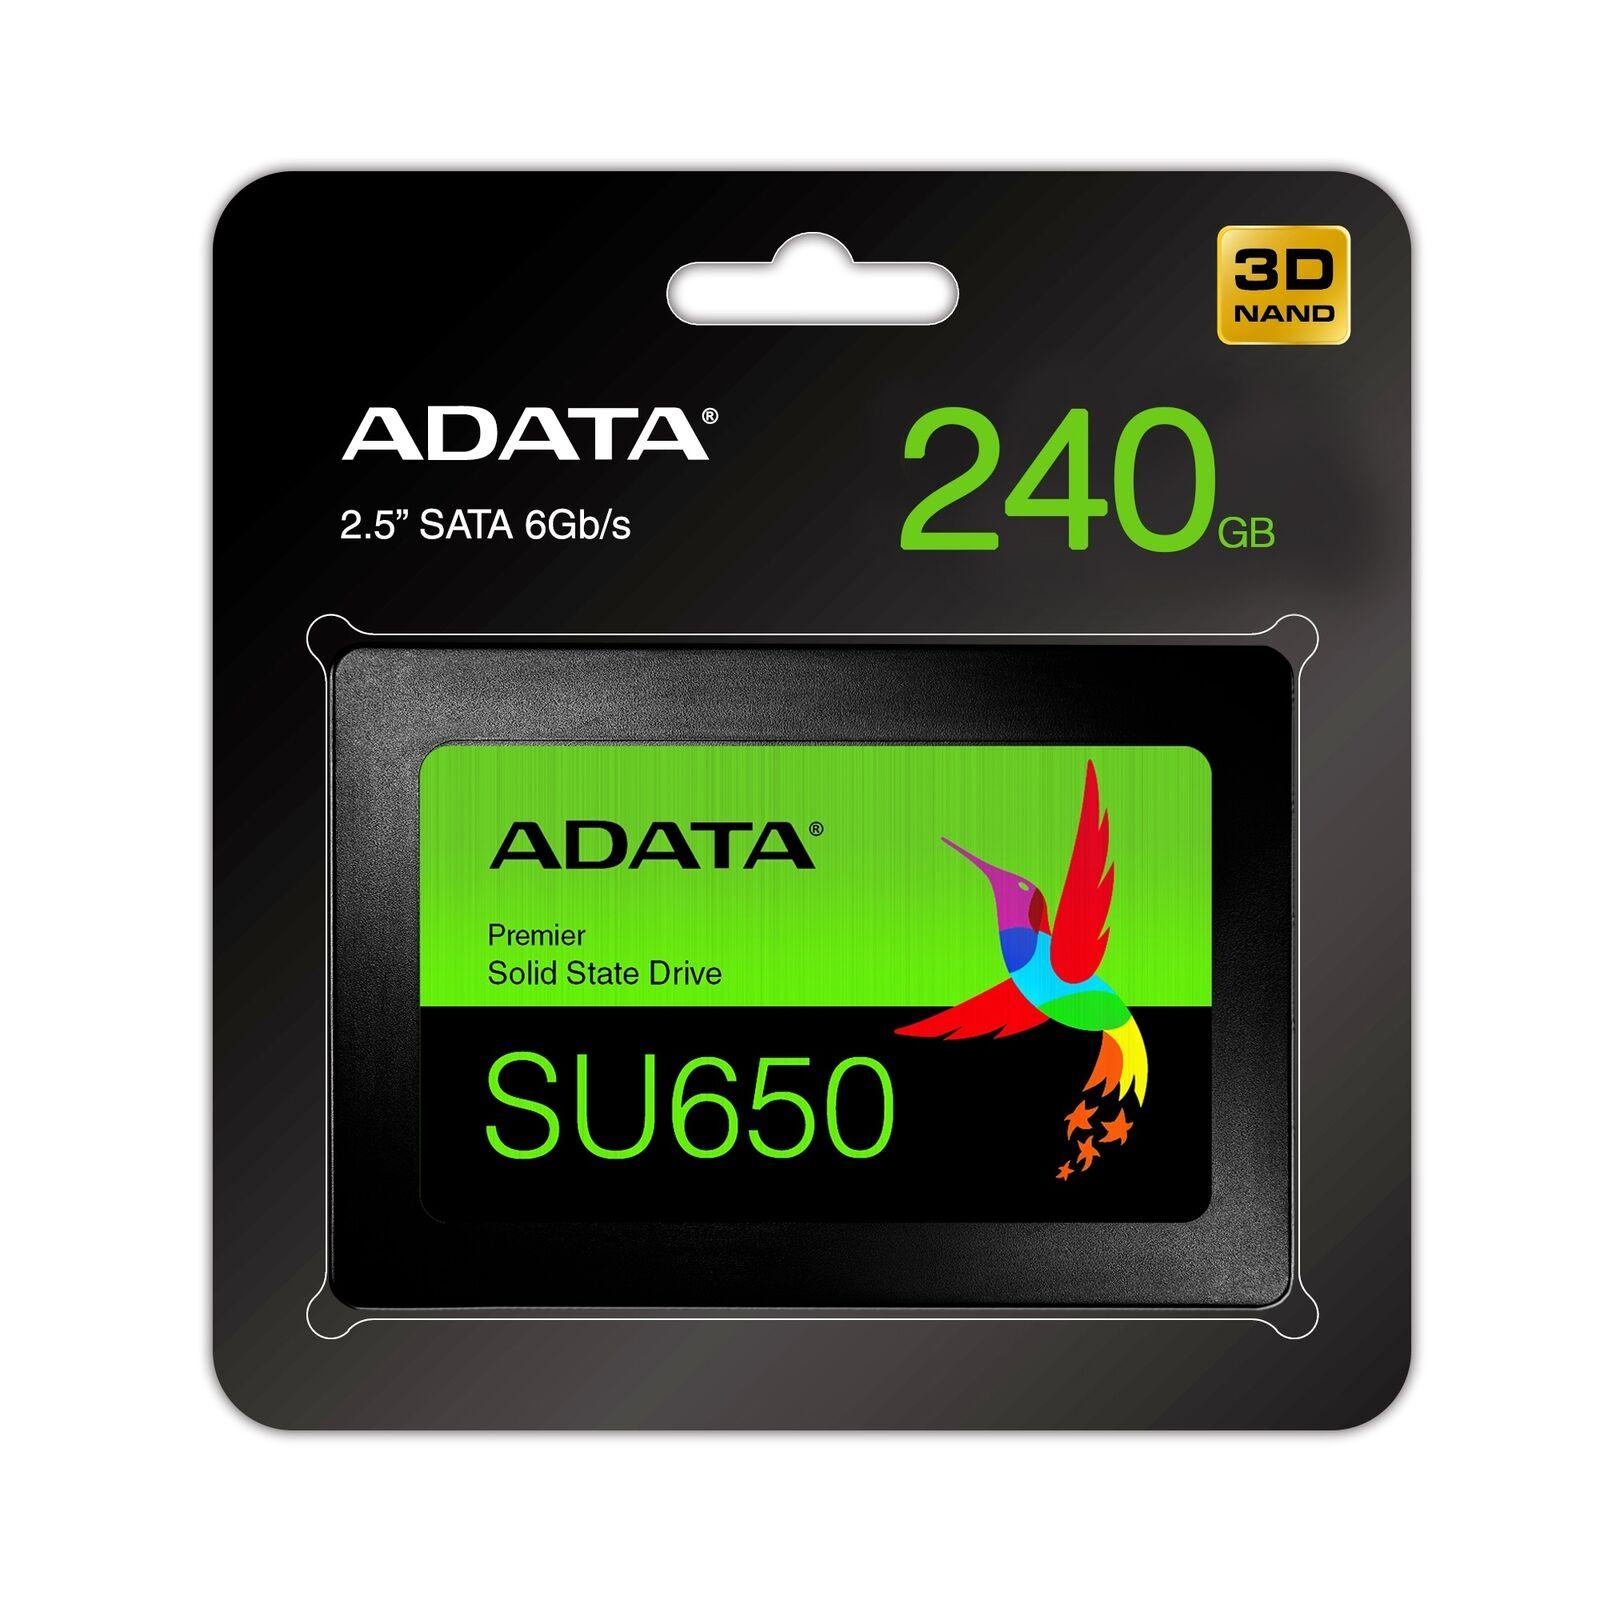 ADATA Ultimate SU650 240GB SATA III Internal, 2 5 inch (ASU650SS240GTC)  Solid State Drive